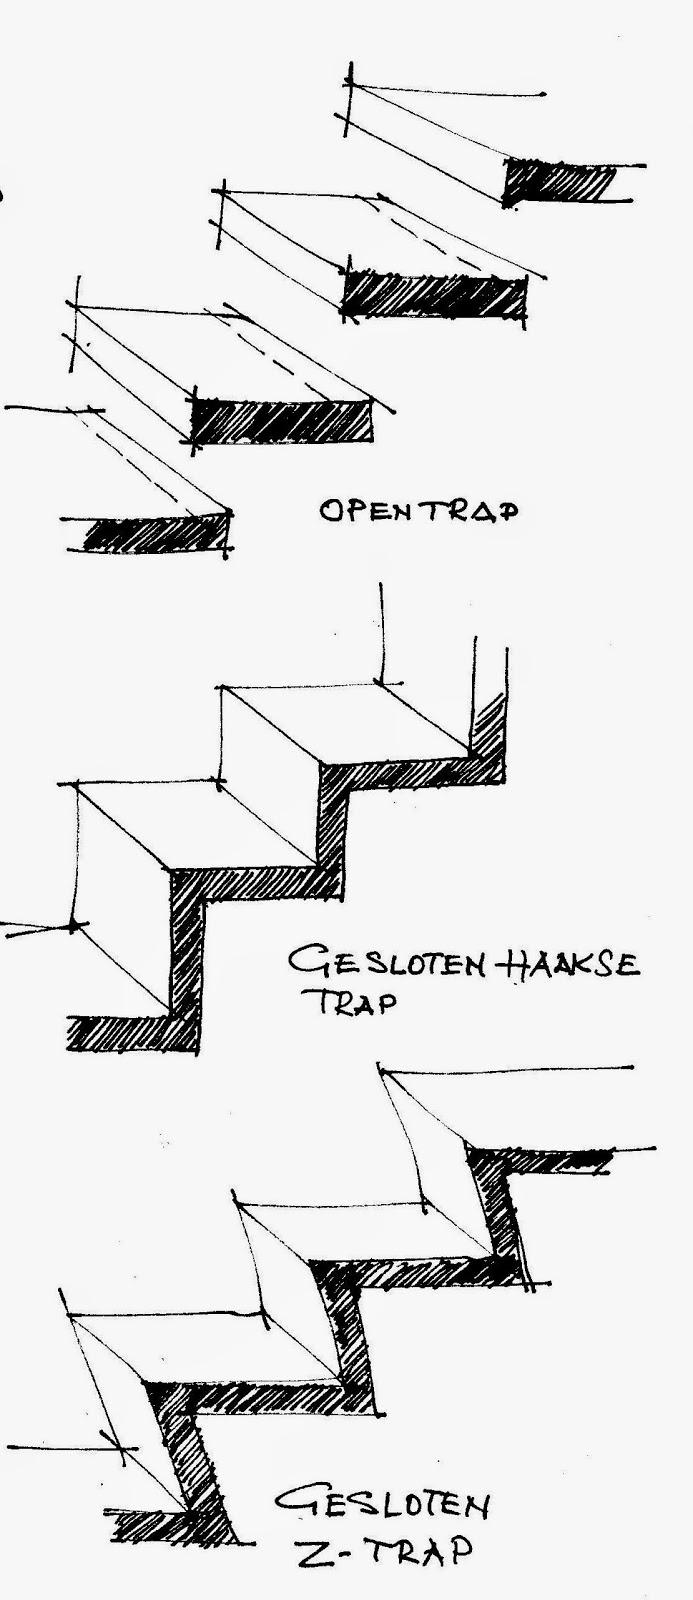 Bouwmaster trappen basisbegrippen for Luie trap afmetingen